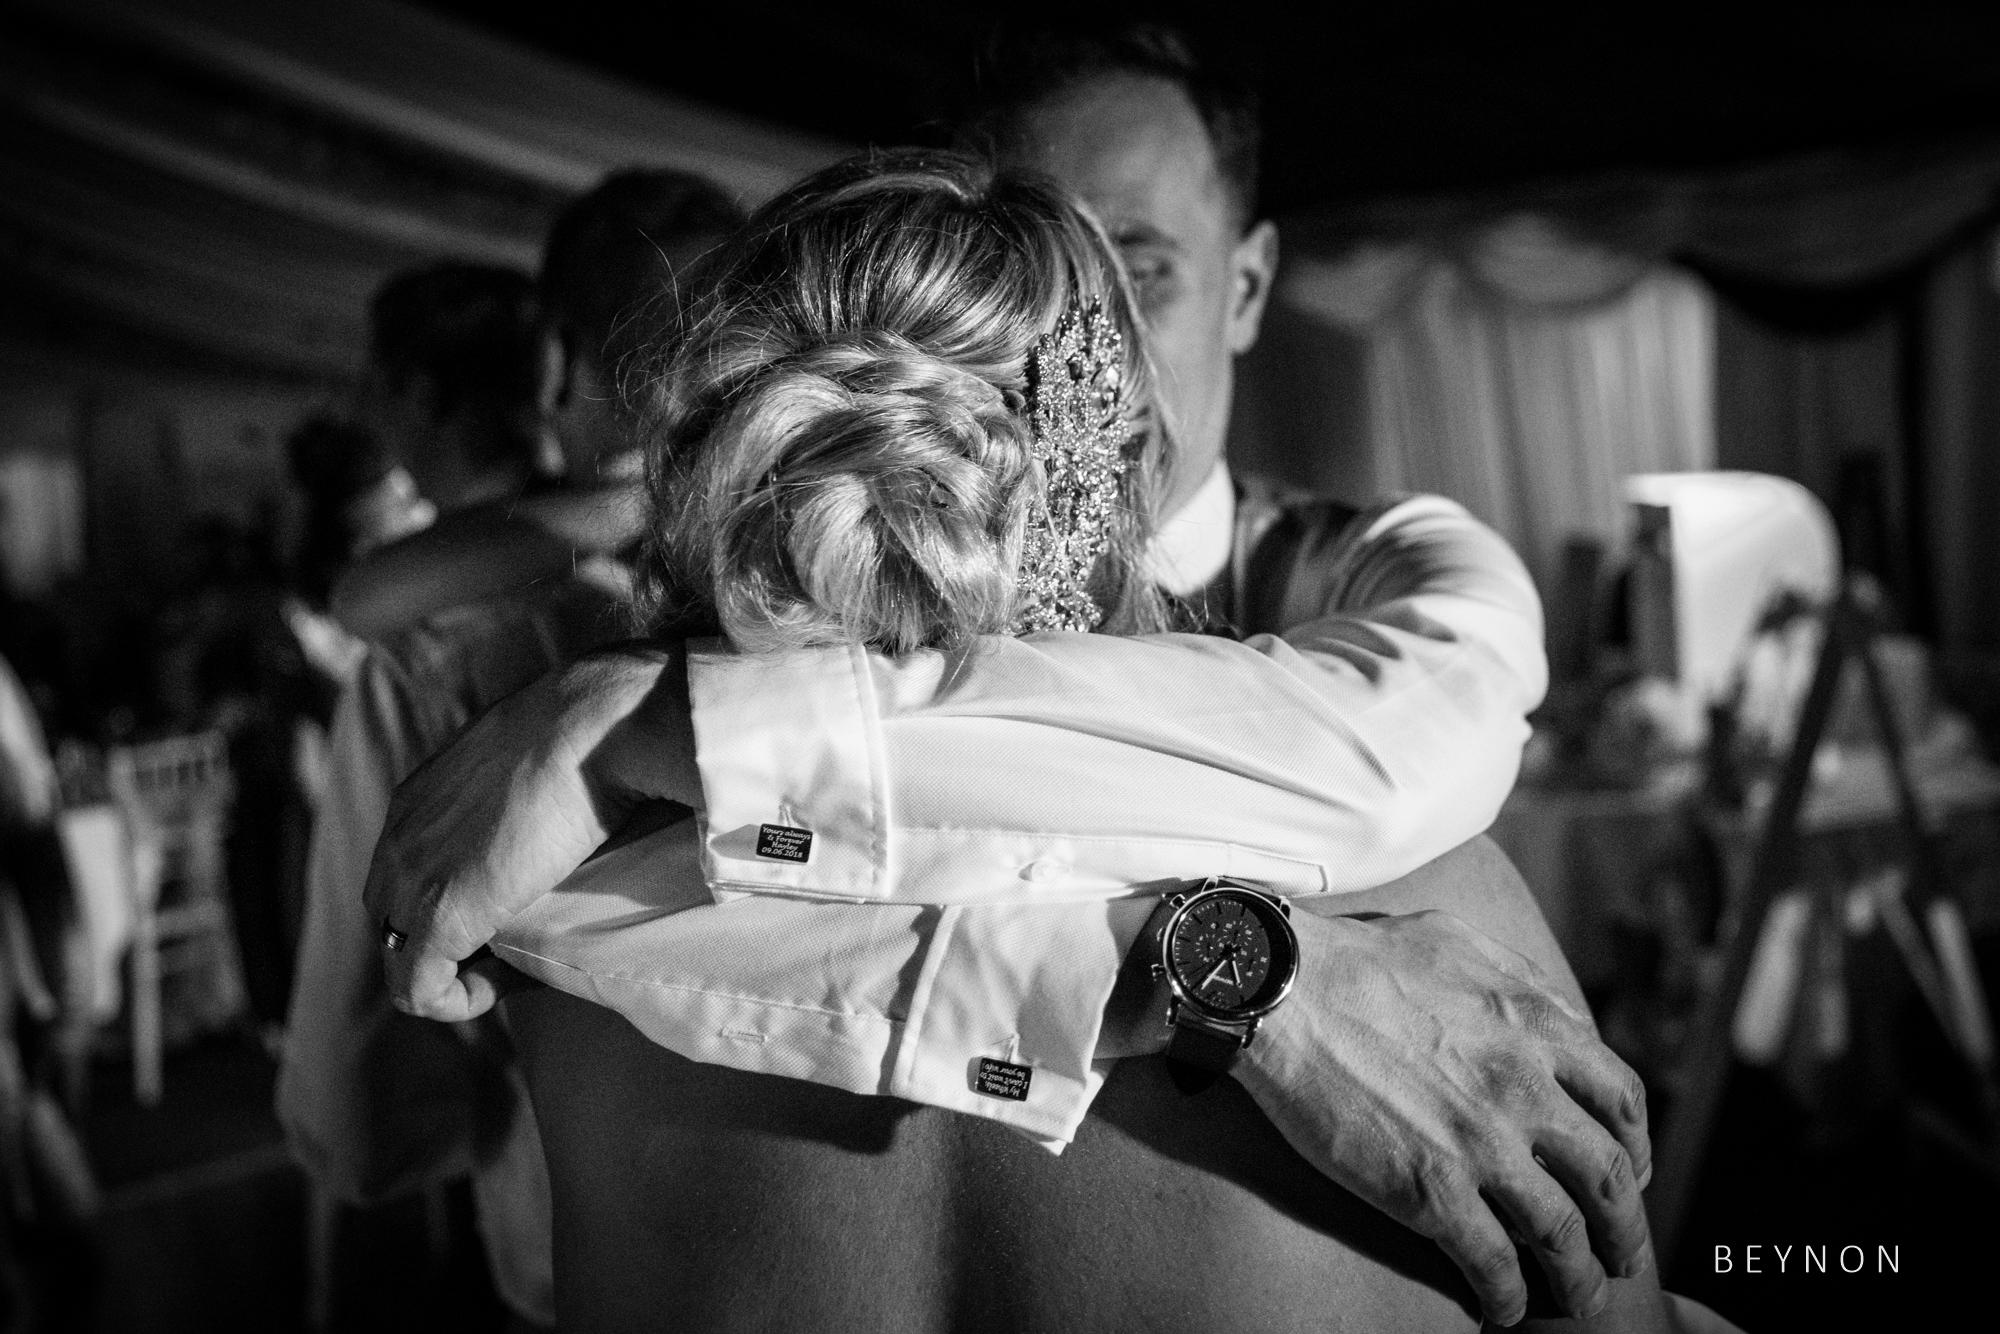 The bride and groom hug